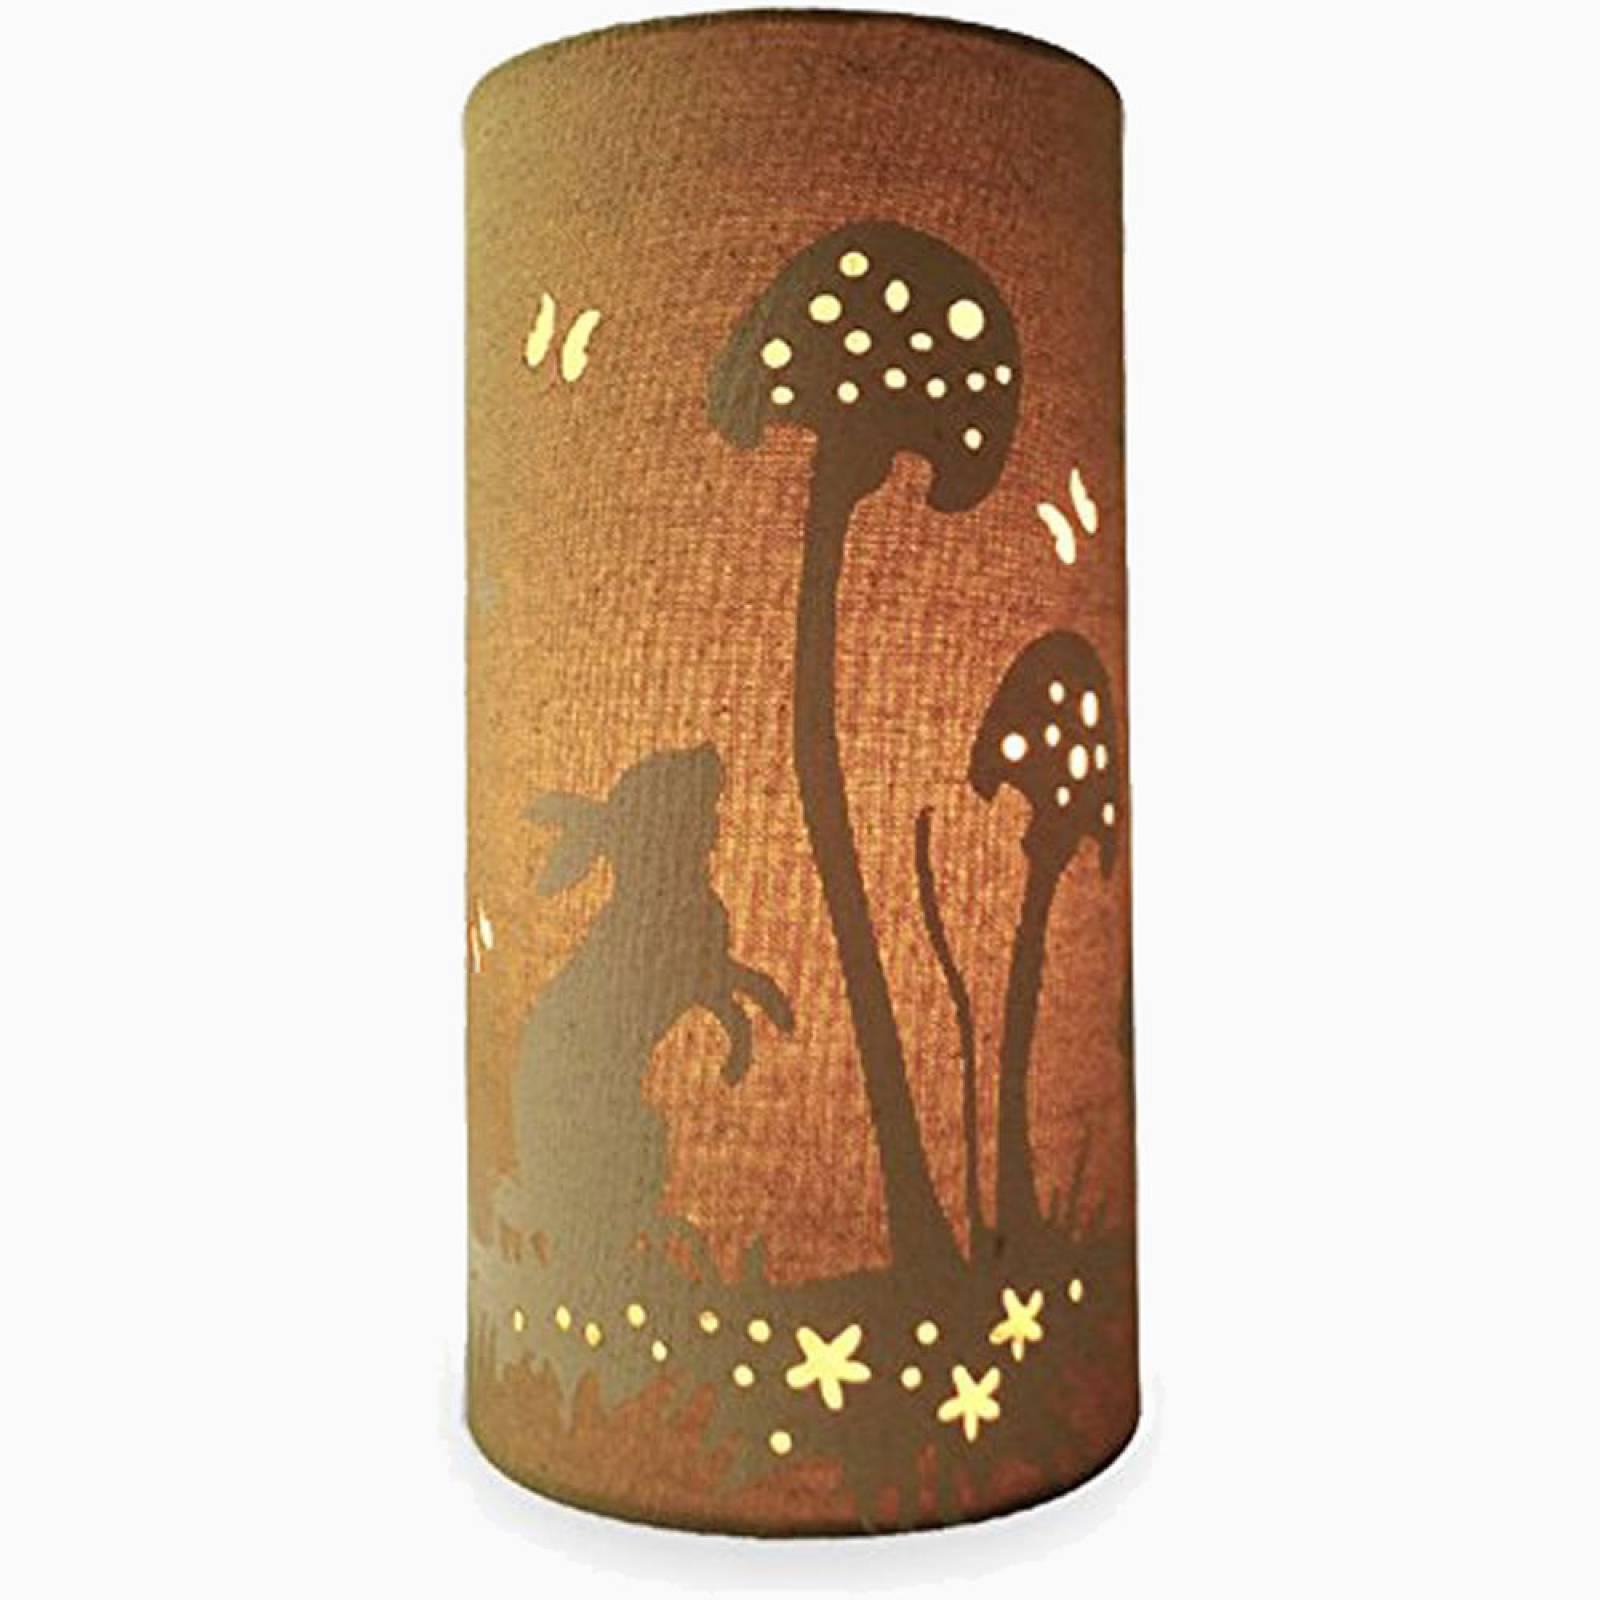 Rabbit - Cylindrical Fabric Lamp